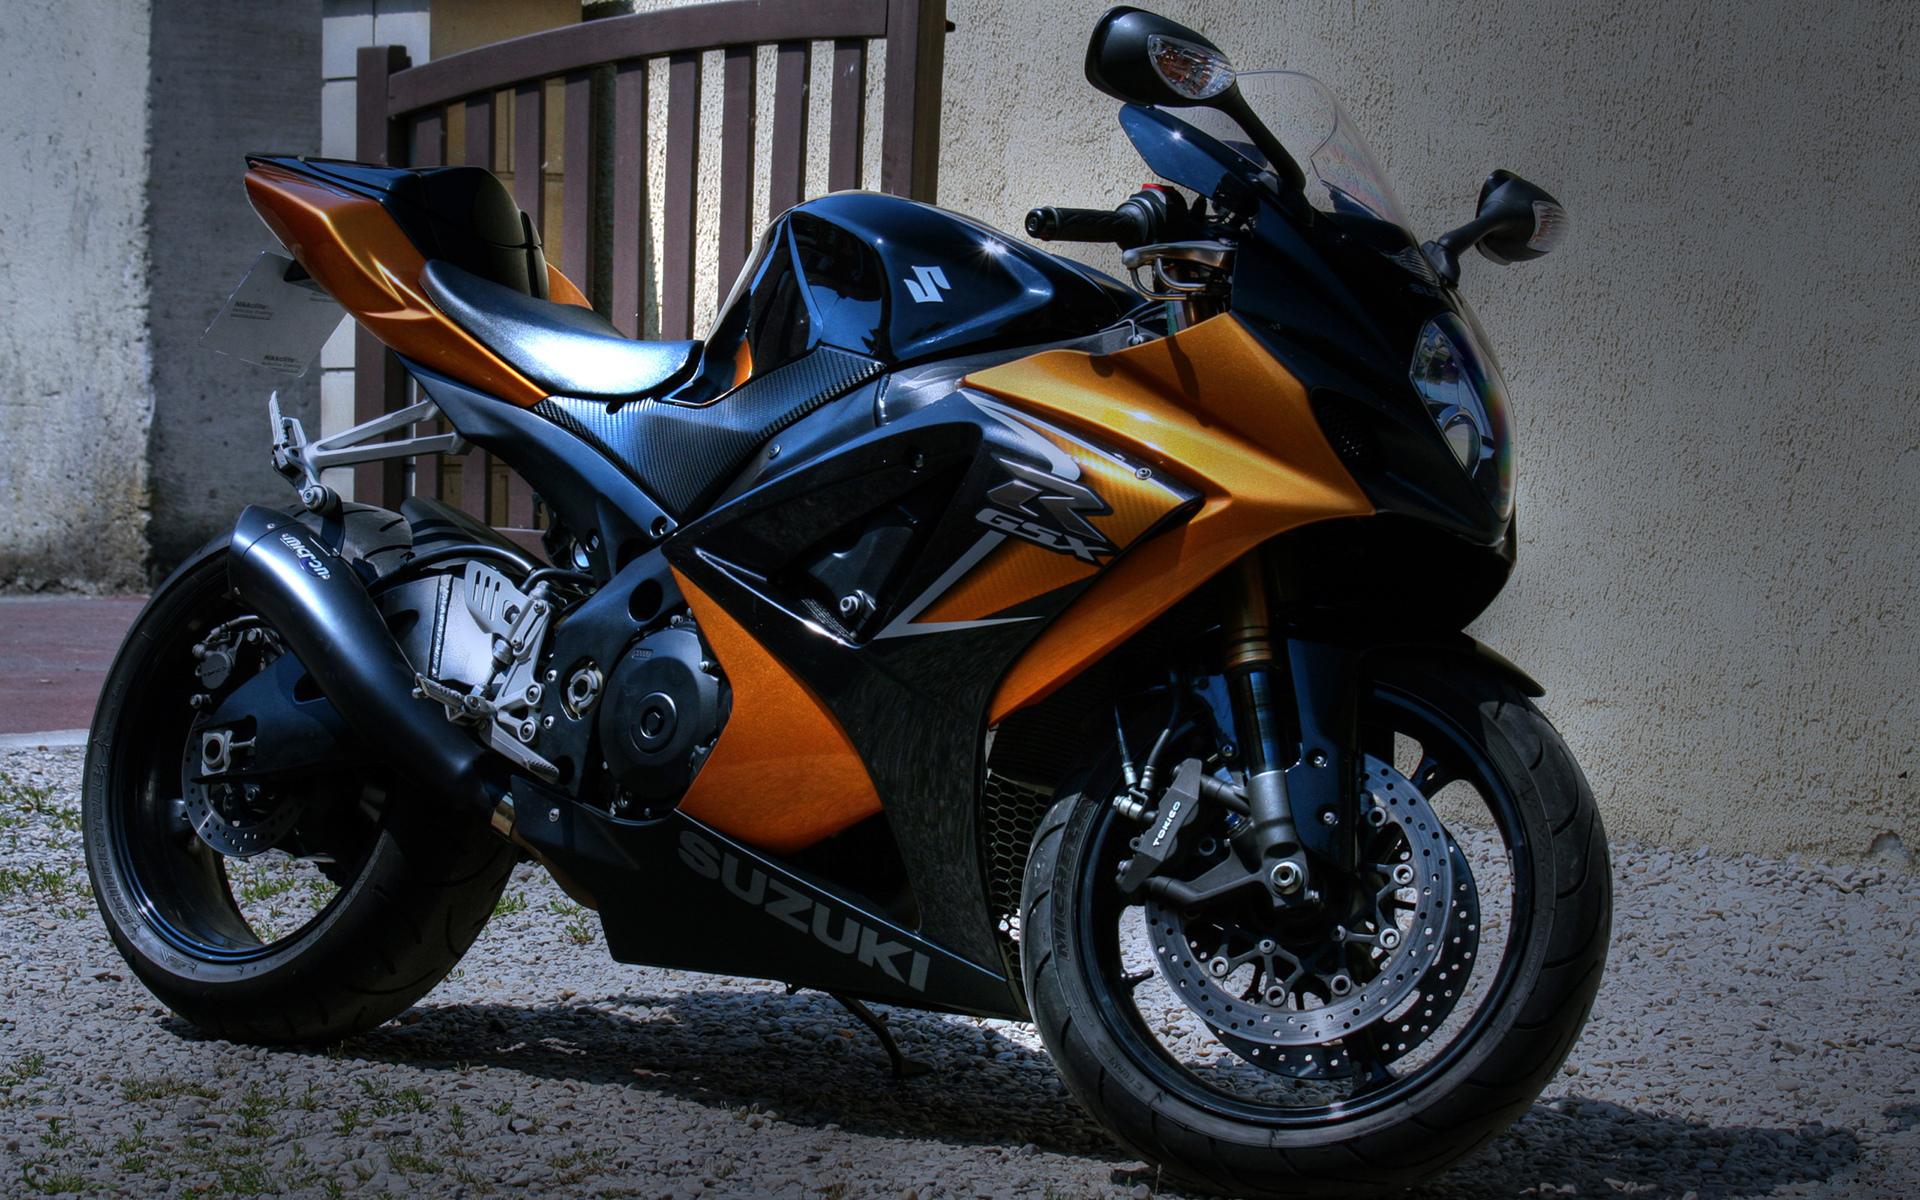 suzuki motocross bike hd - photo #20